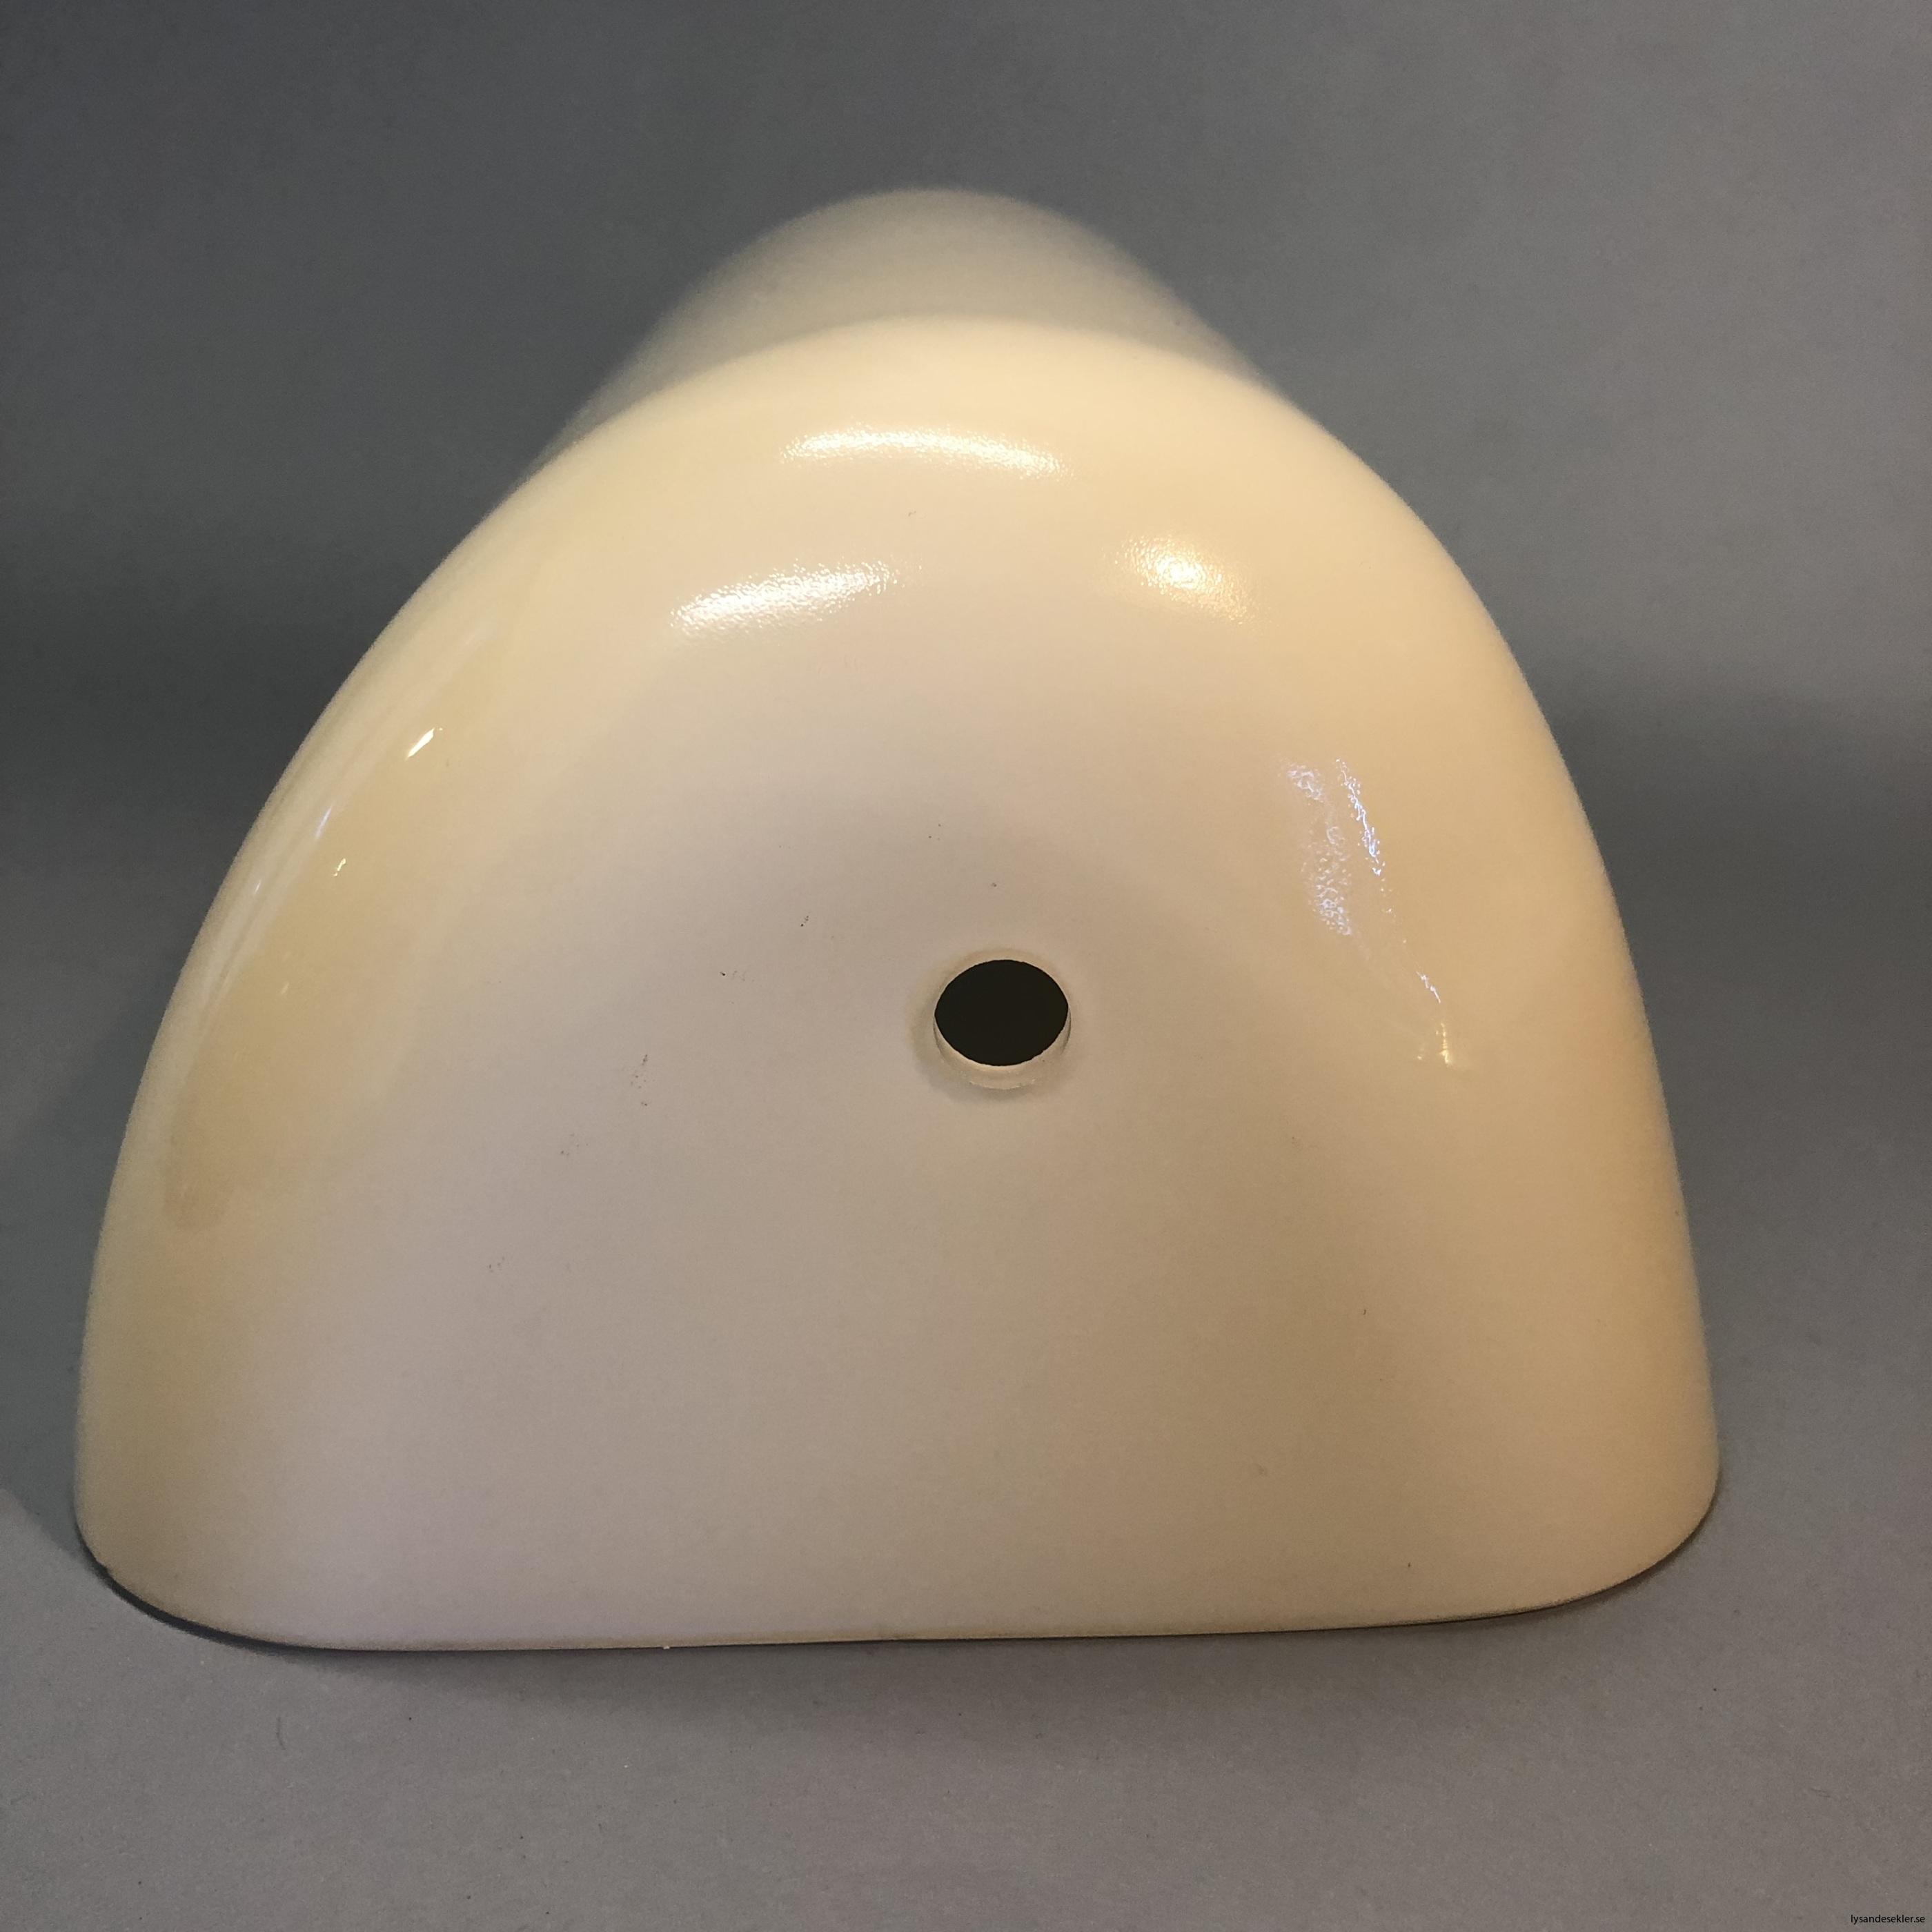 reservglas bankirlampa bibliotekslampa amerikalampa grönt lampglas gult reservglas extraglas6